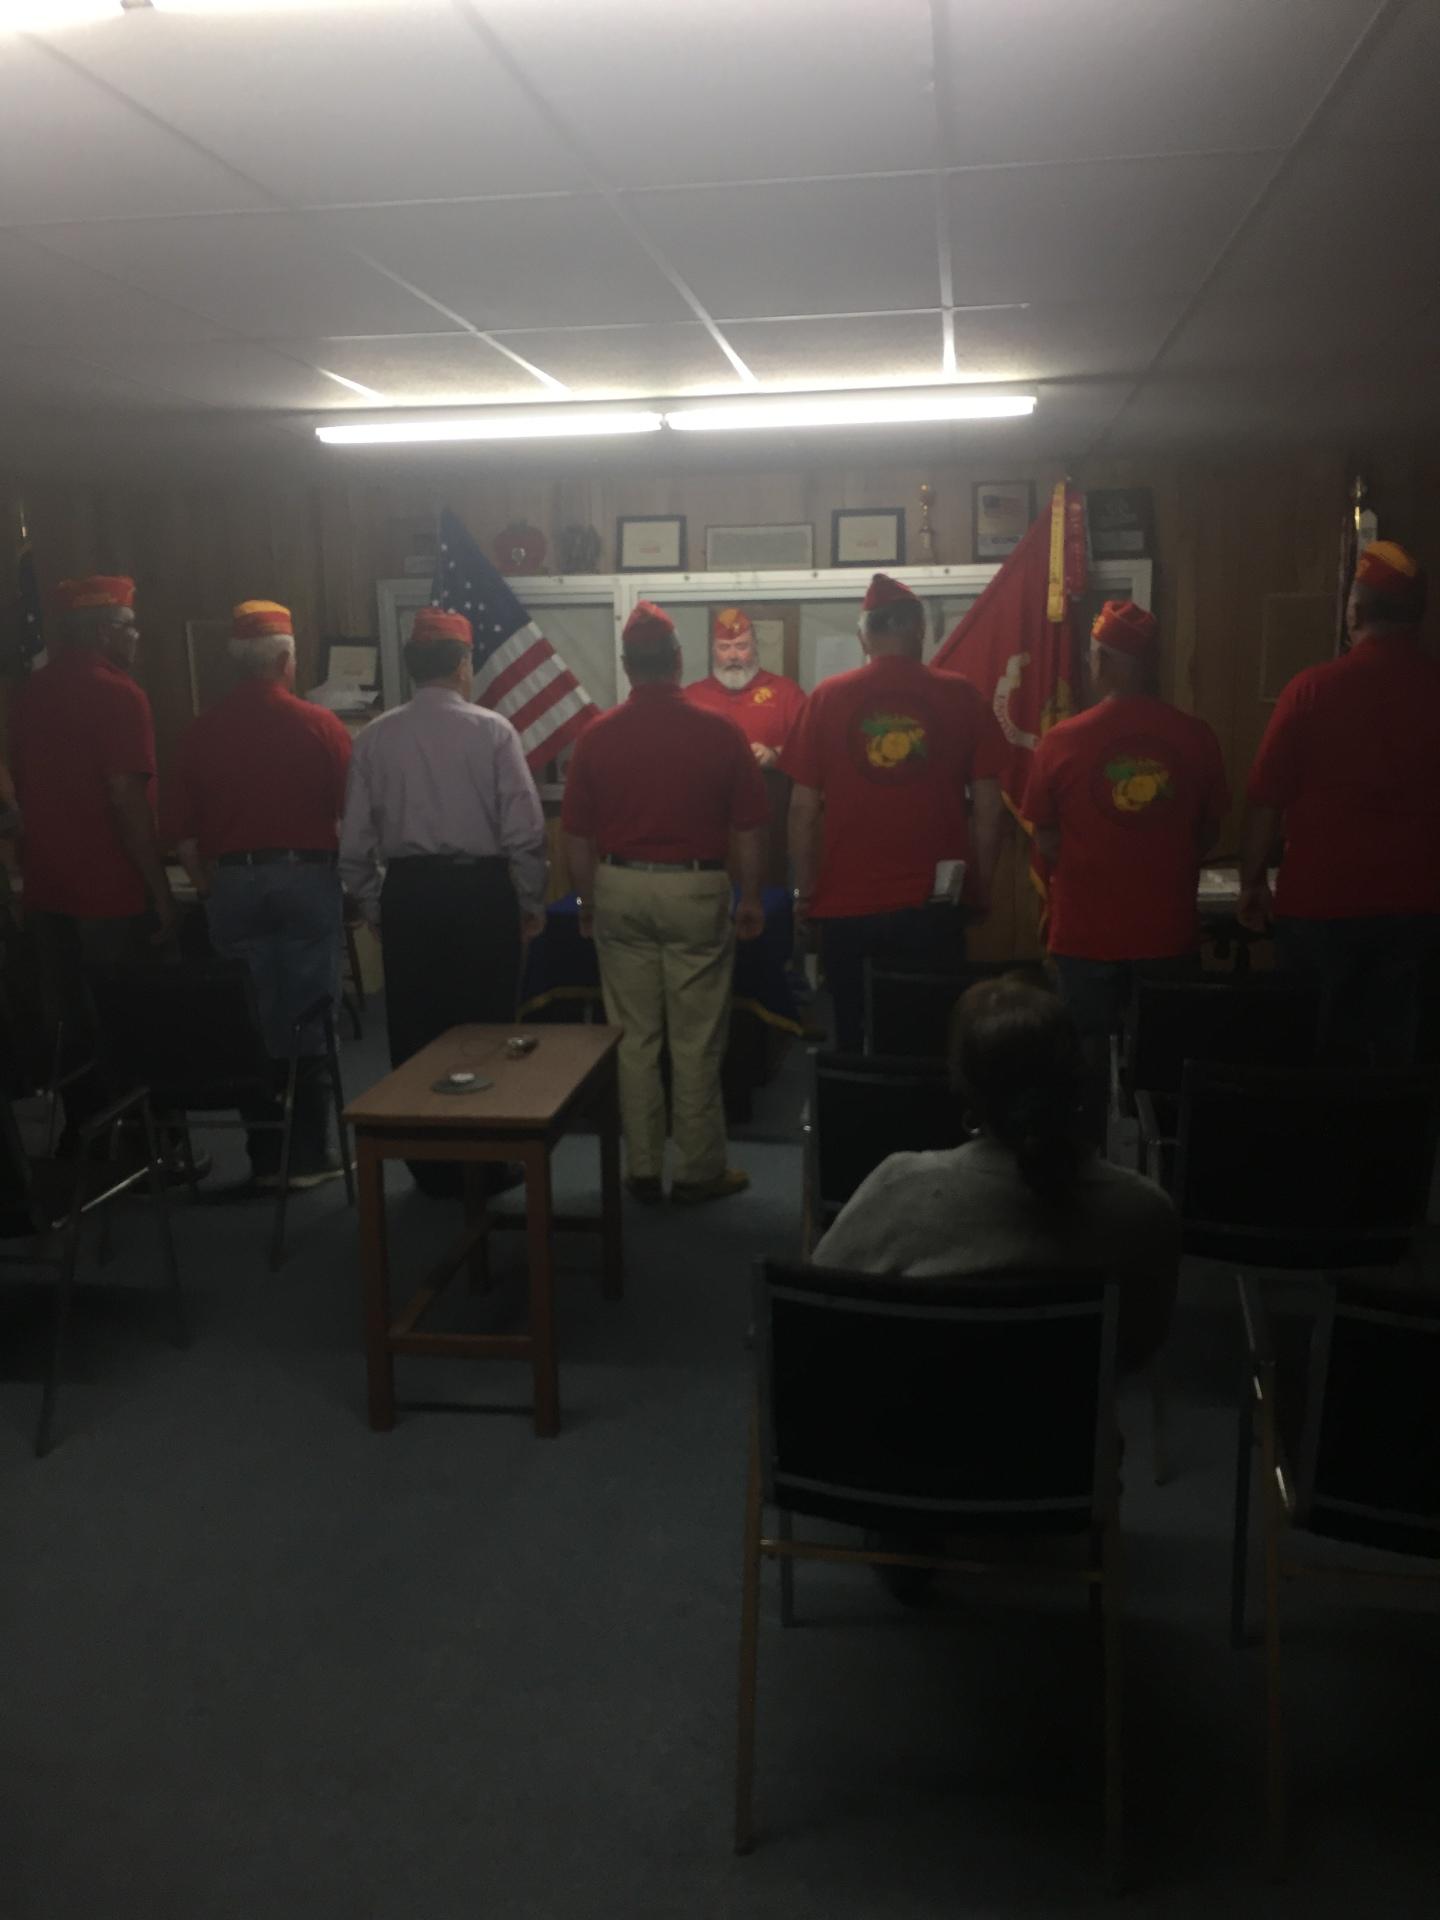 Lt-Rt; George Deckard, Dan singletary, Manny Guerrero, Kevin Gratehouse, Chuck Bones, Kenneth Rains, Steve Lee, Chris Borel